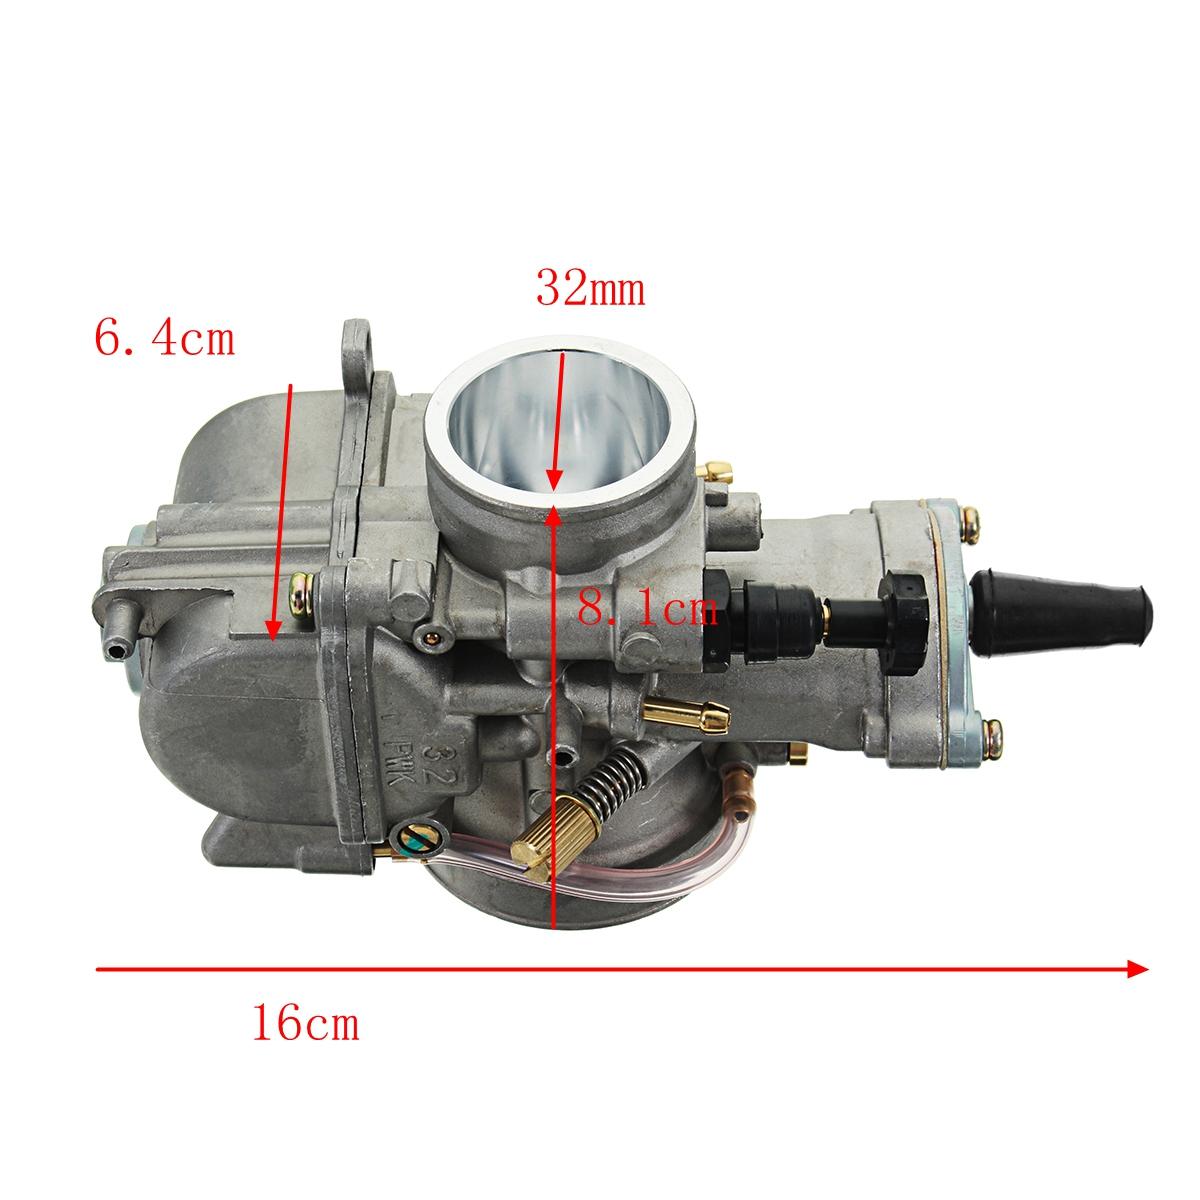 PWK 28mm/30mm/32mm/34mm Motorcycle Racing Motor Carburetor with Power Jet